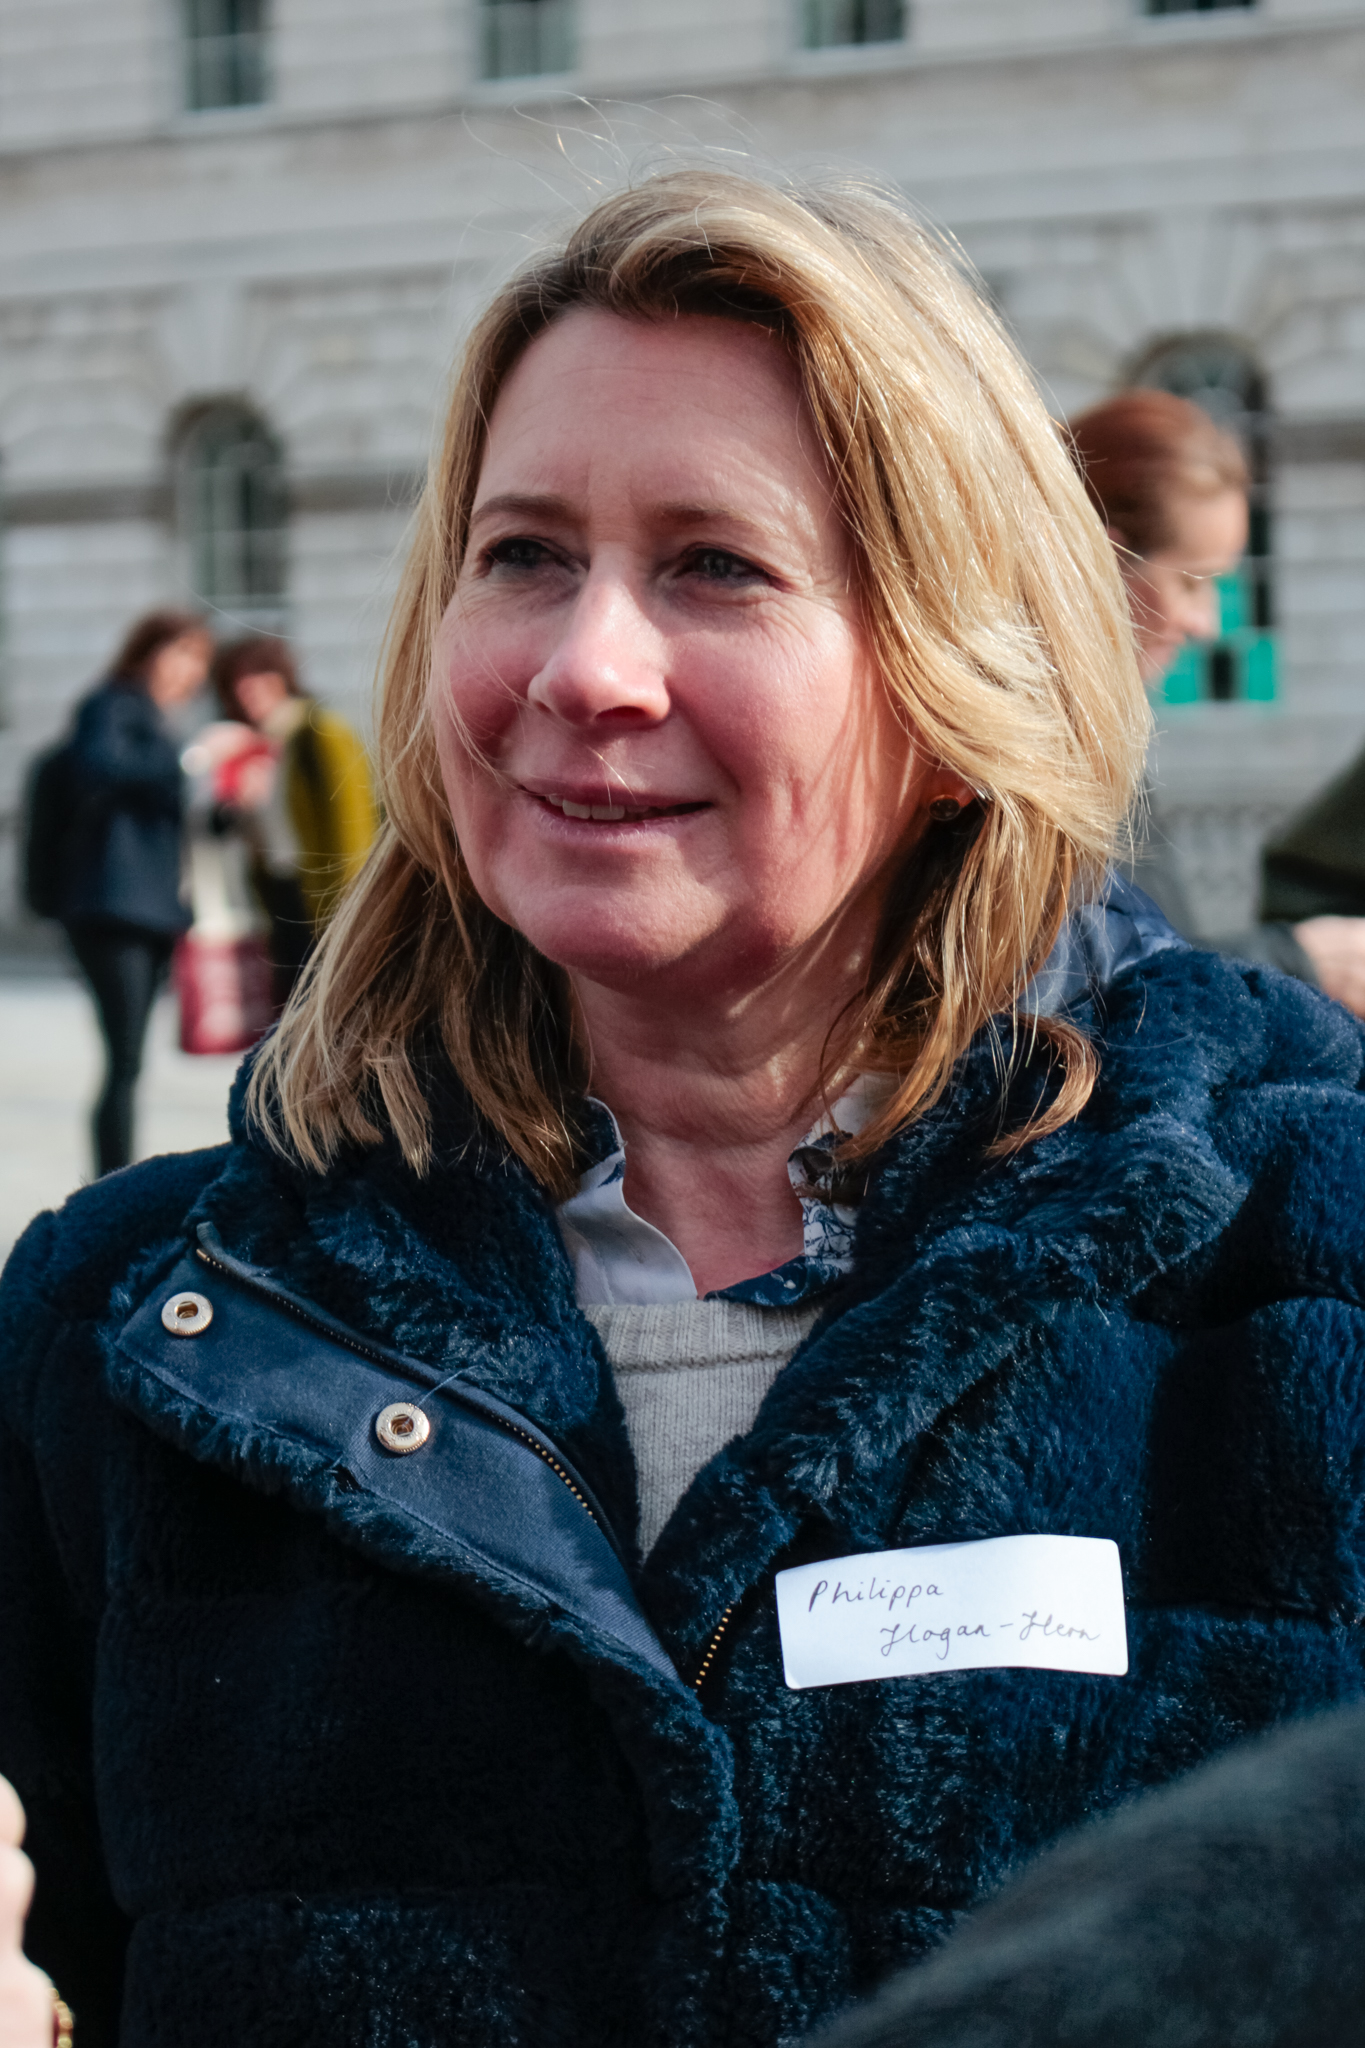 Philippa Hogan Hern